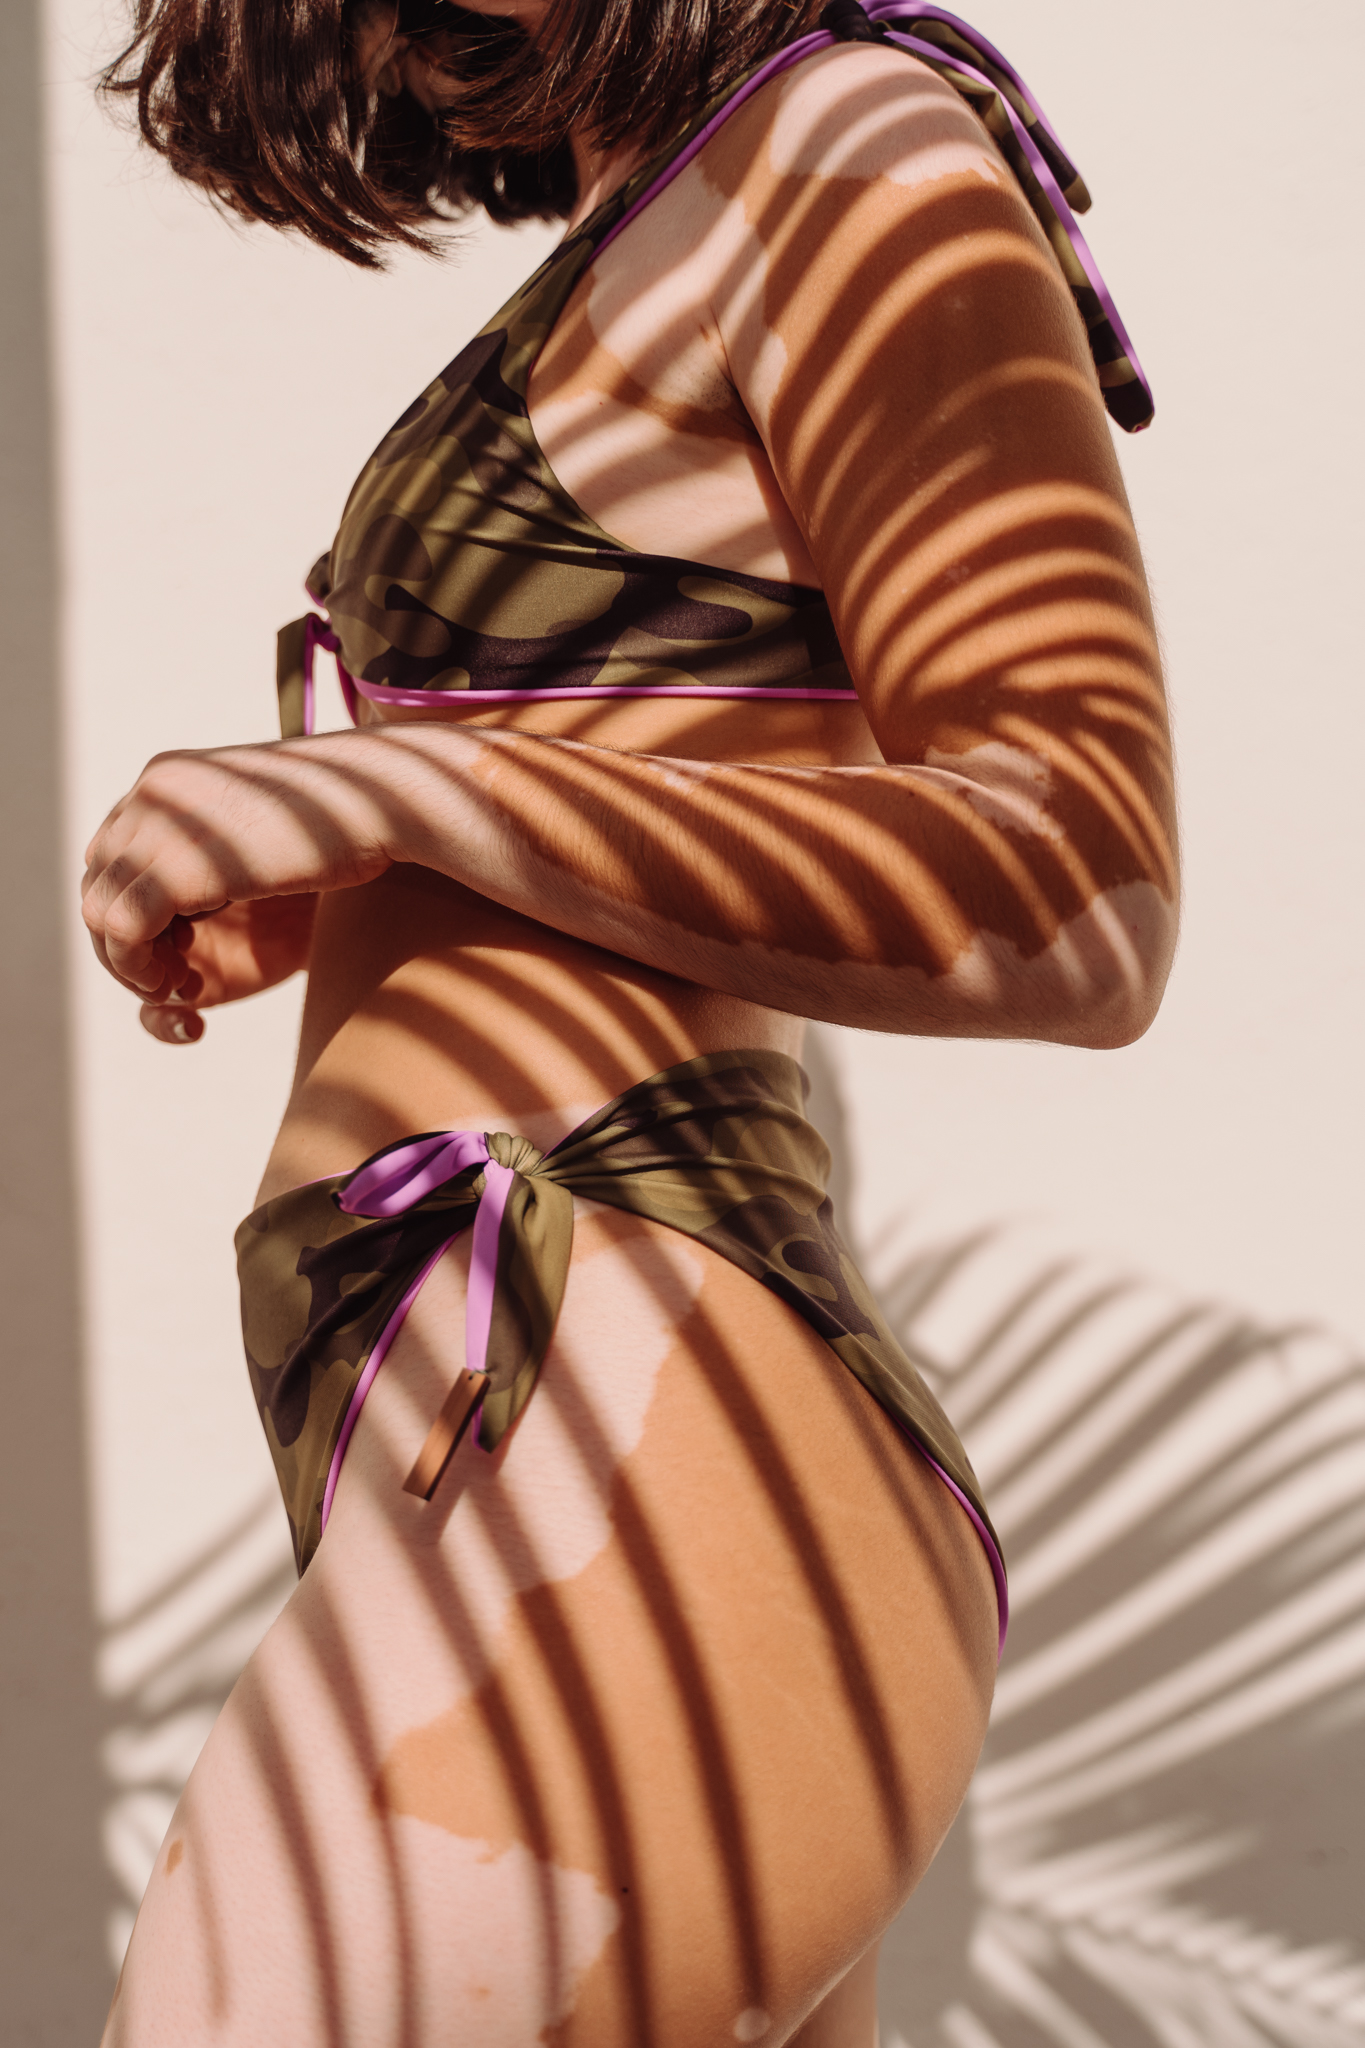 Salpica Swimeart x Ashly & Cristina_Extras-3.jpg